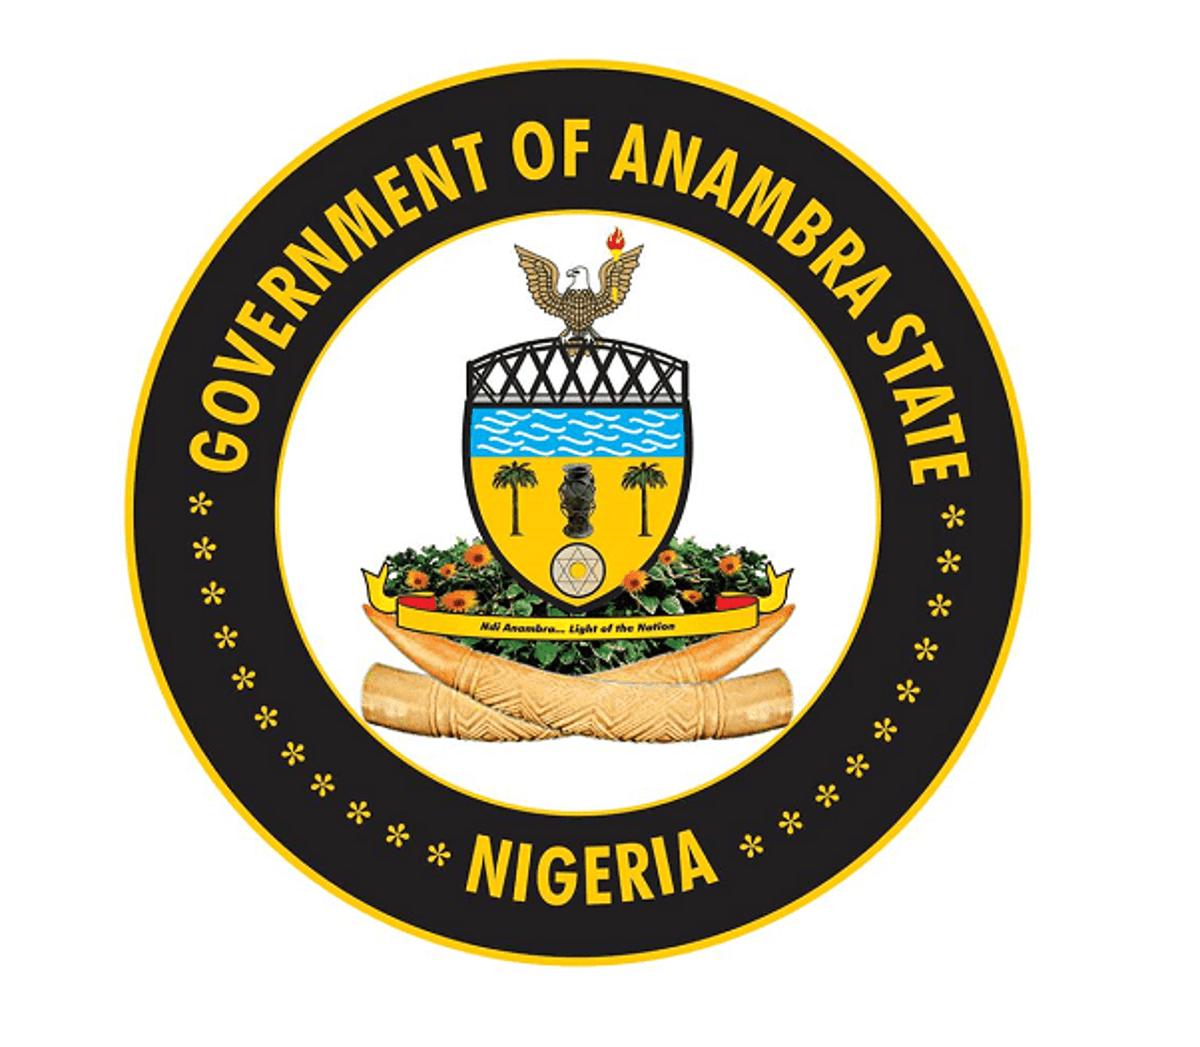 Nigeria news : Anambra govt denies alleged receipt of N25bn bond from FG